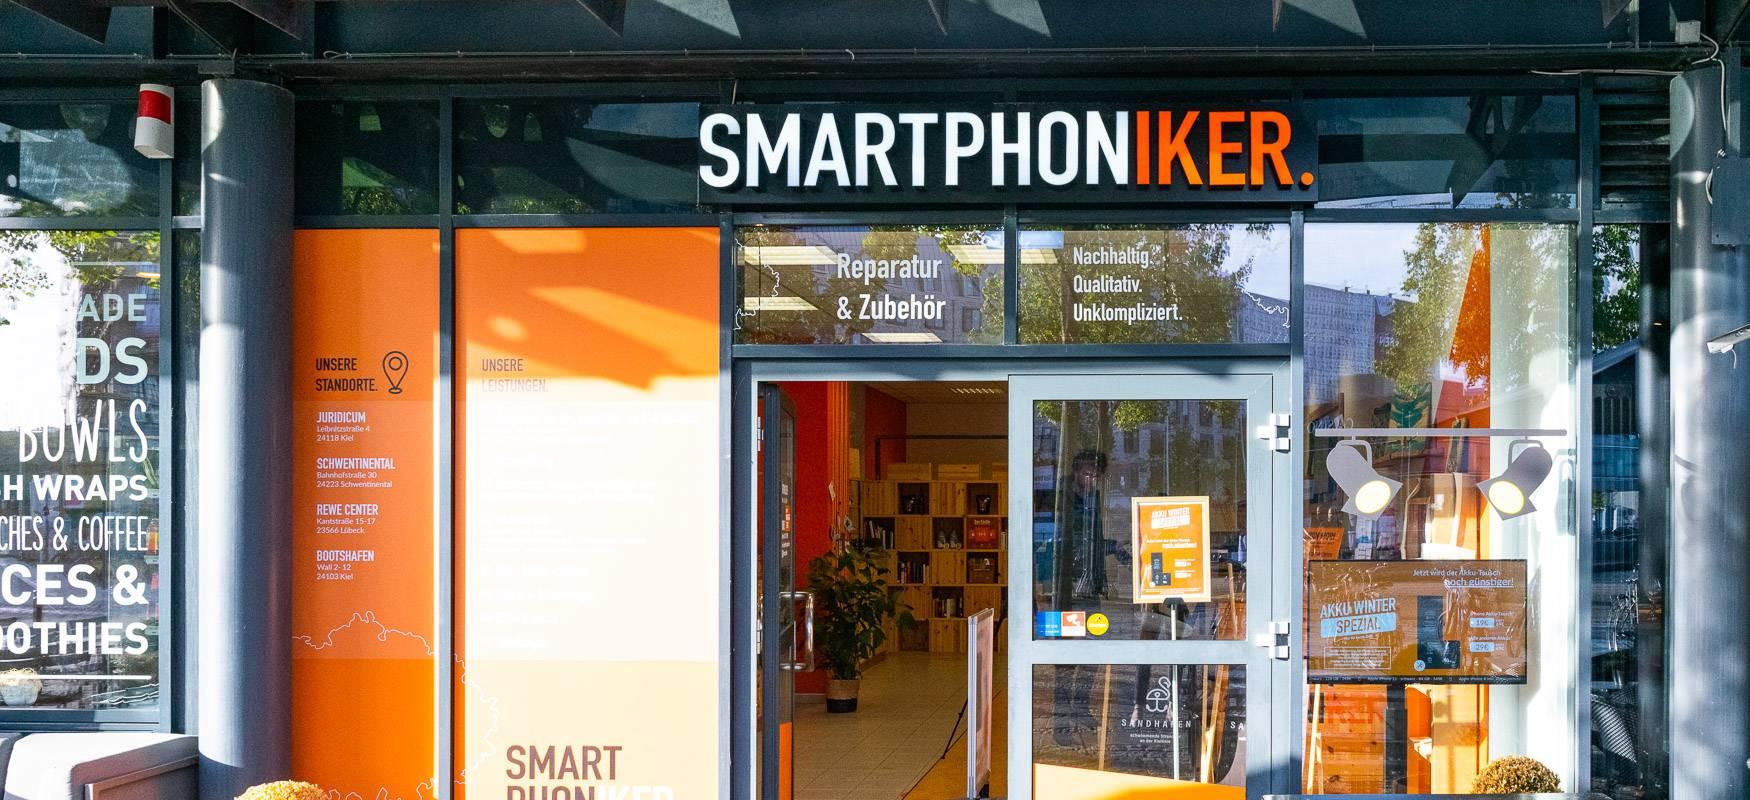 Kiel Smartphoniker Reparatur 6 Smartphoniker